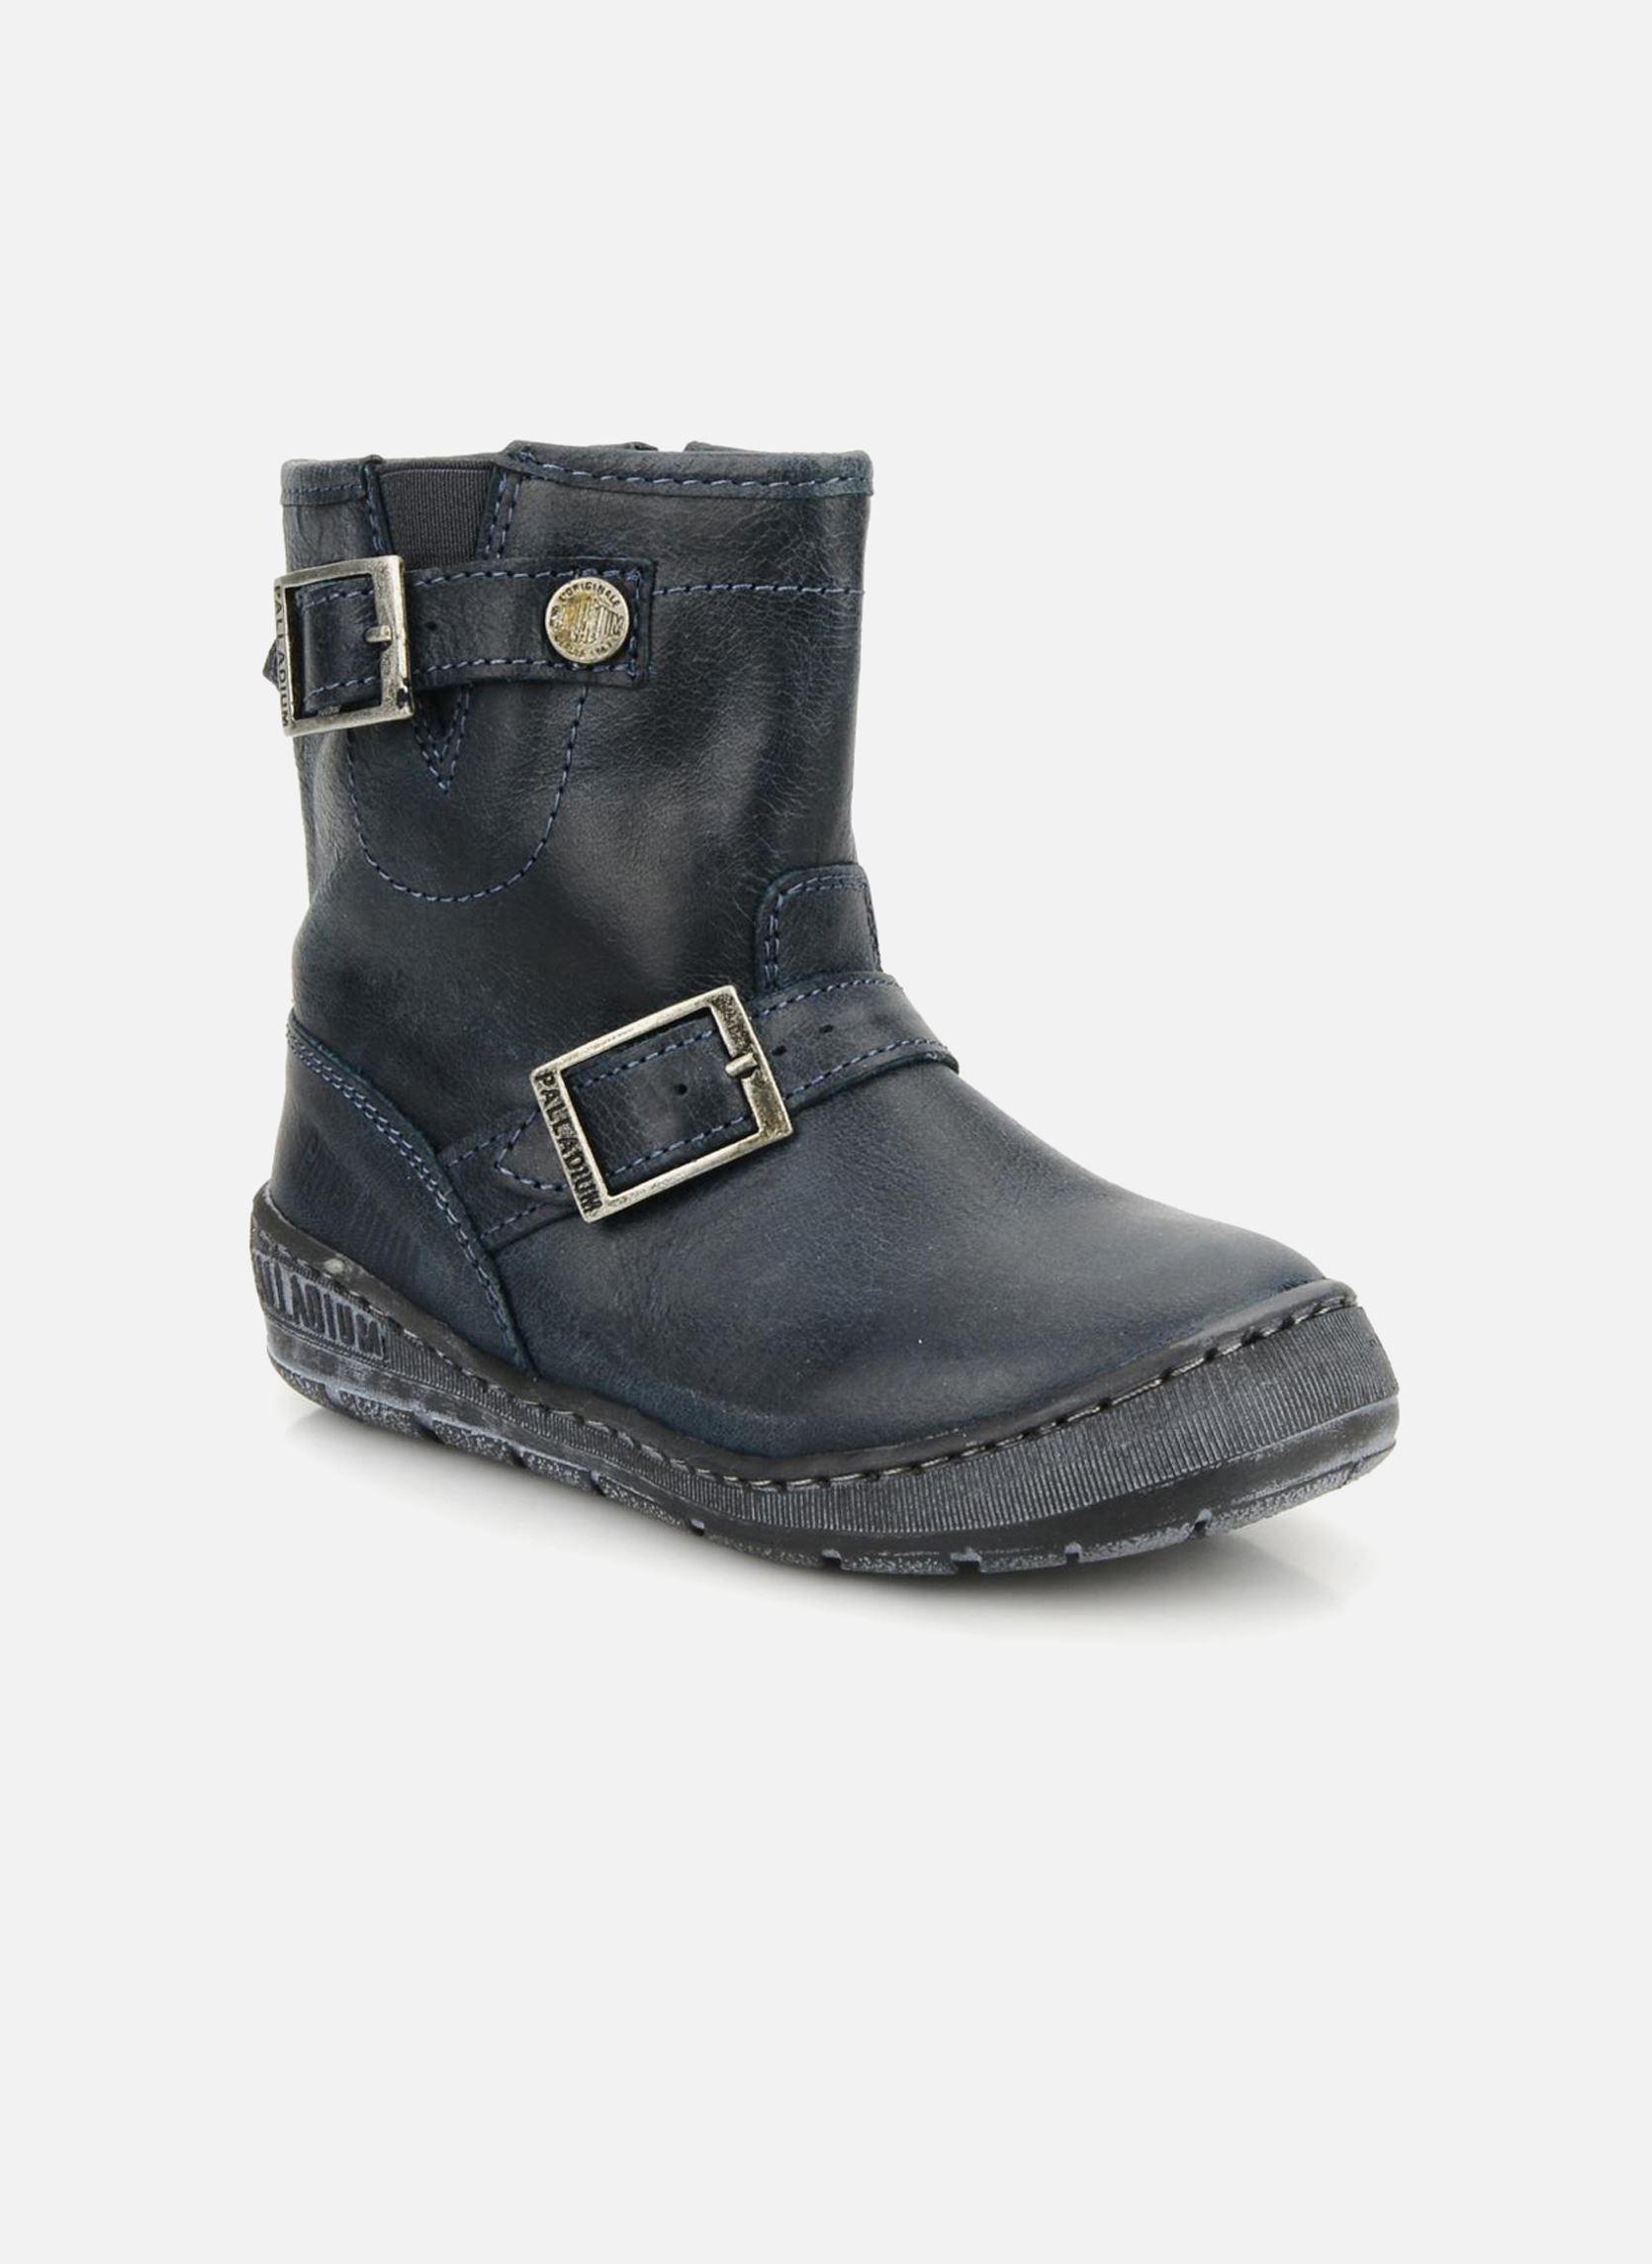 New Balance Shoes Botto